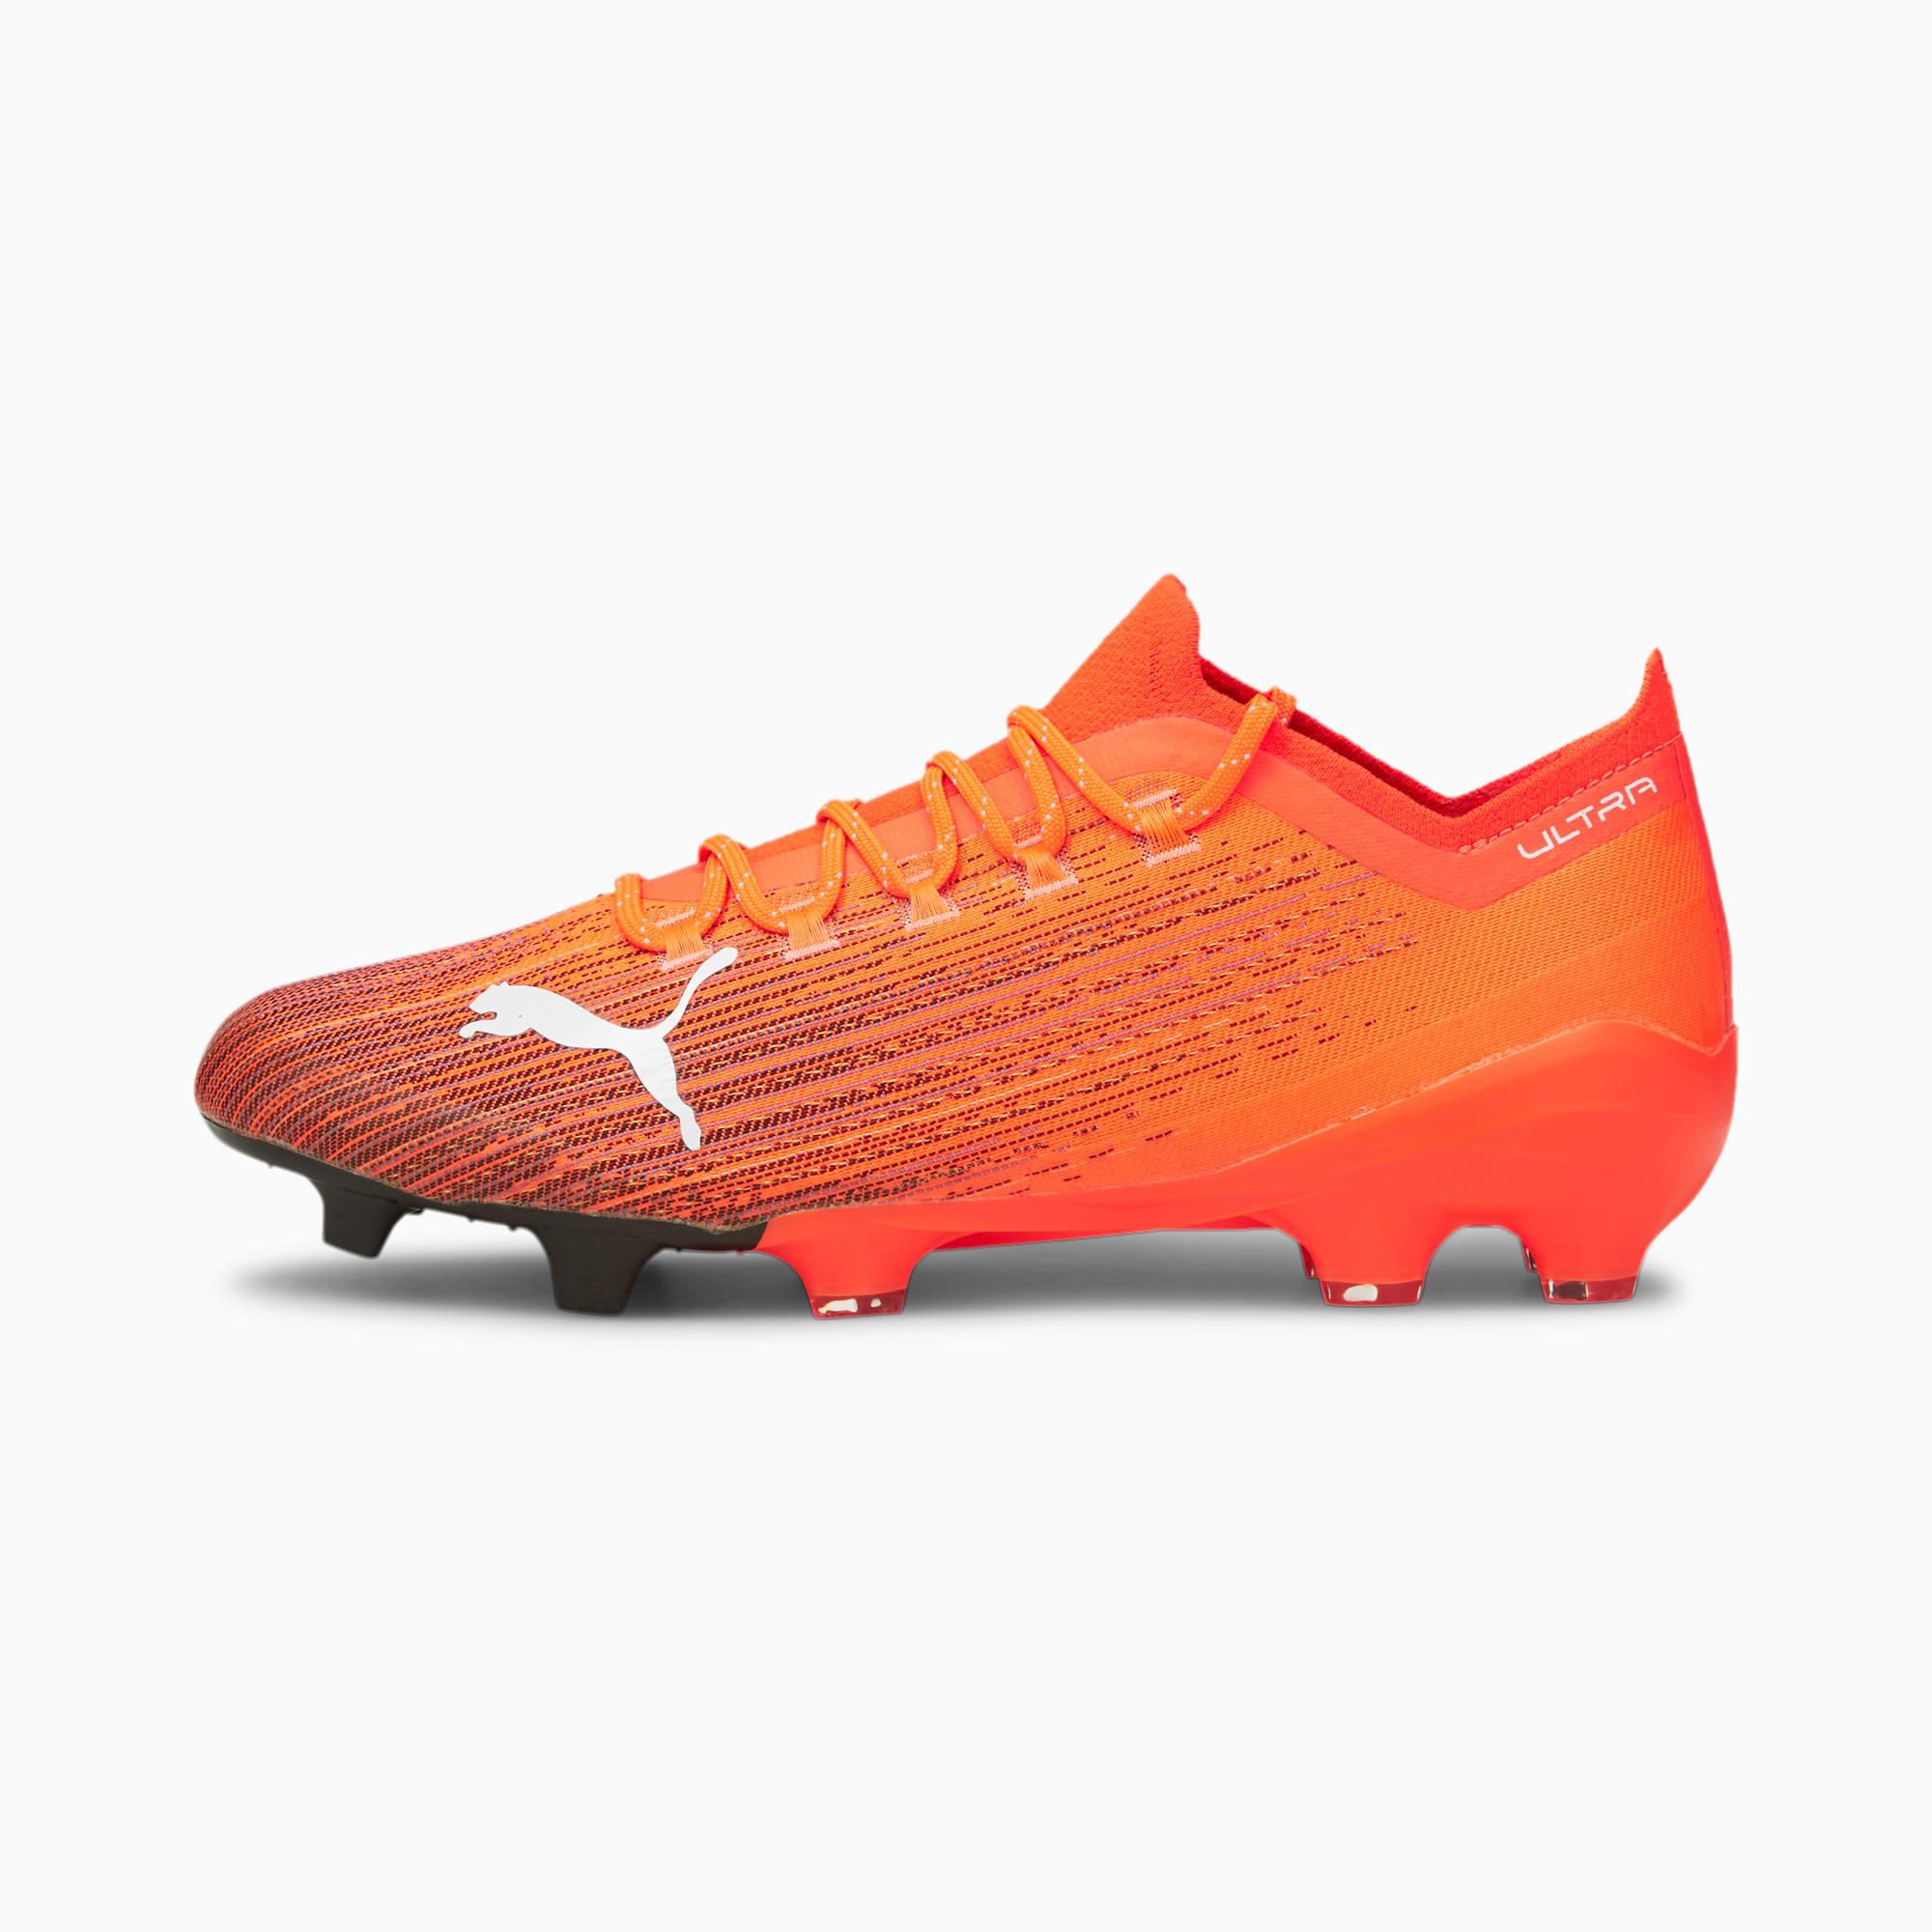 ULTRA 1.1 FG/AG Soccer Cleats, Shocking Orange-Puma Black, extralarge